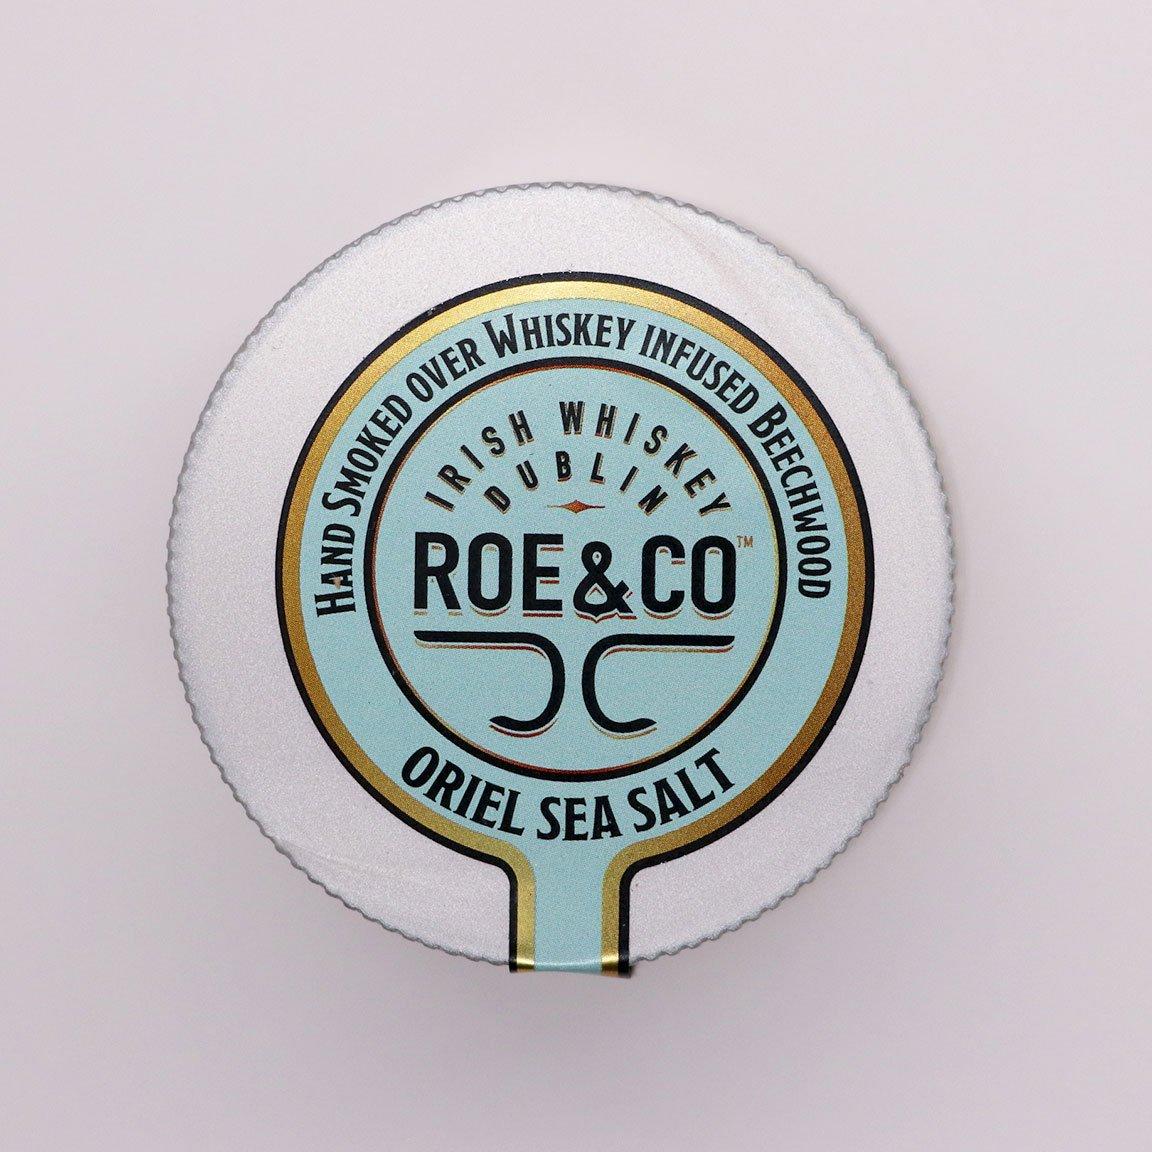 Oriel Sea Salt - Roe & Co Hand Smoked Whiskey